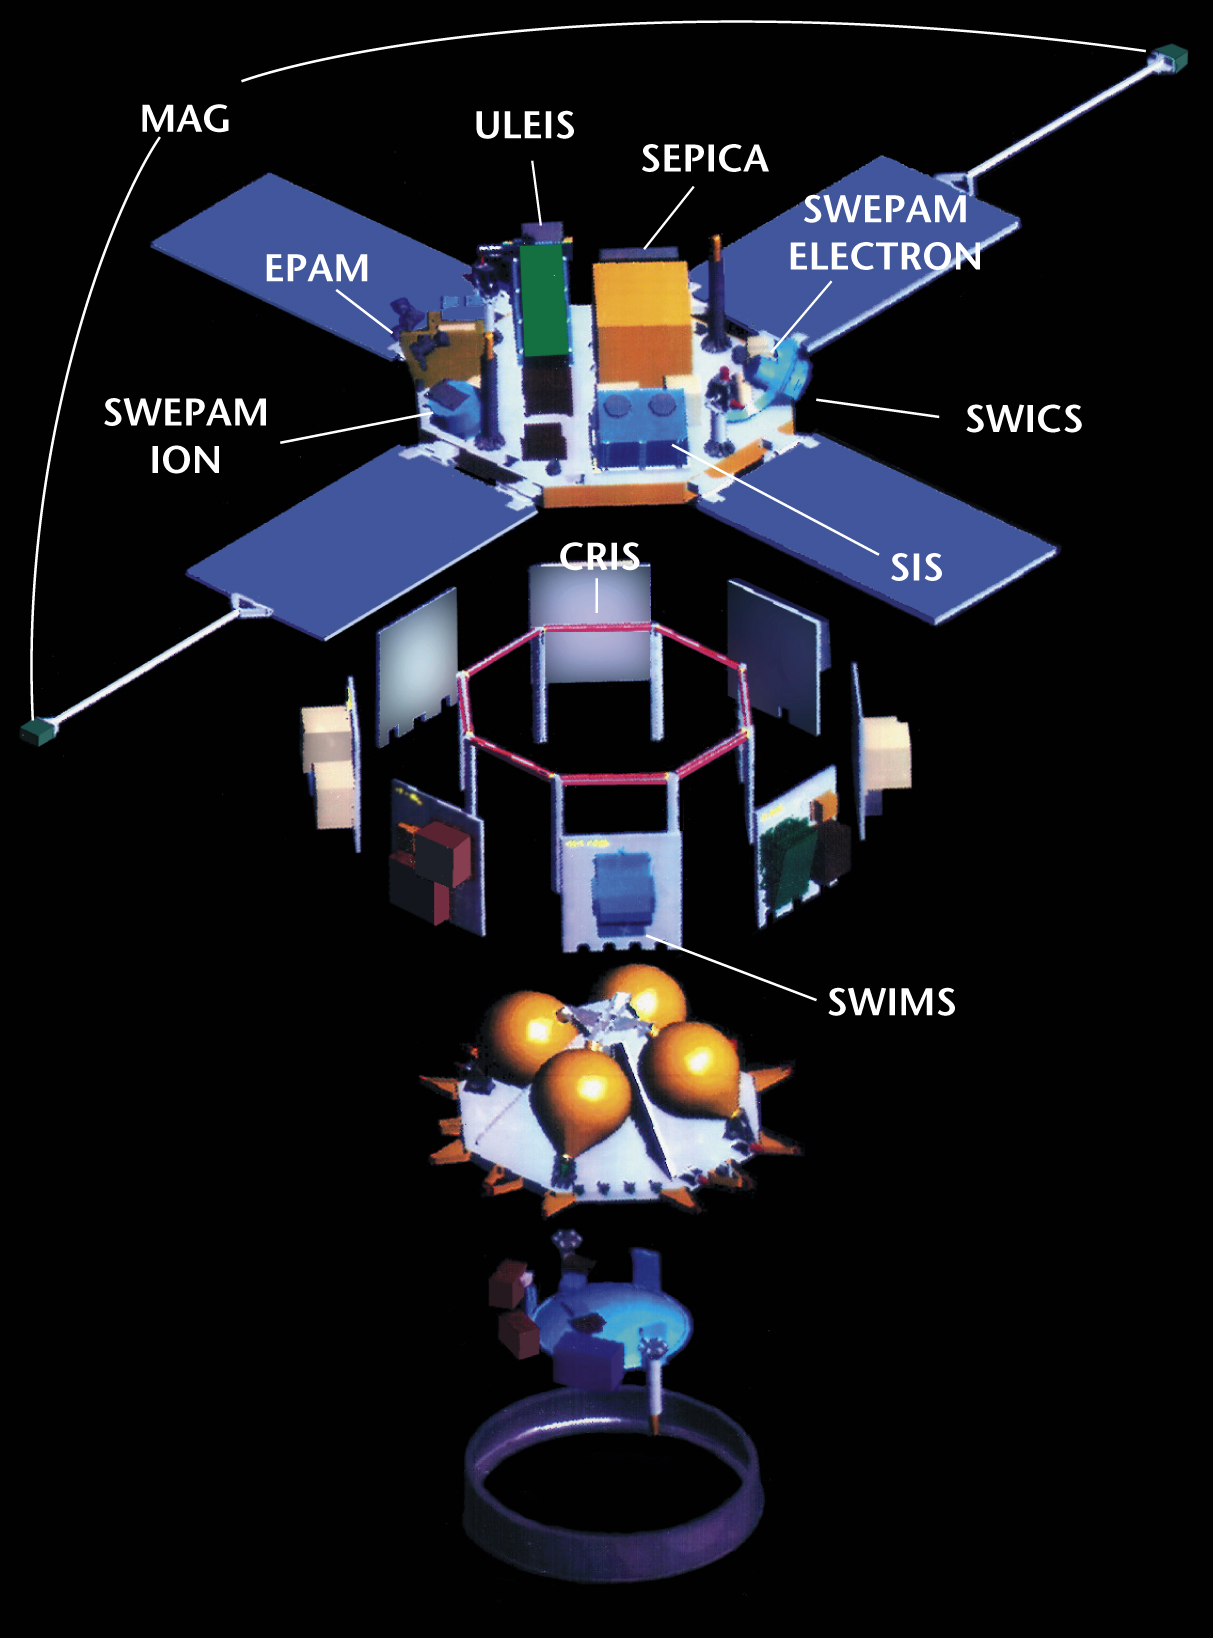 ACE, workhorse of NASA's heliophysics fleet, is 15